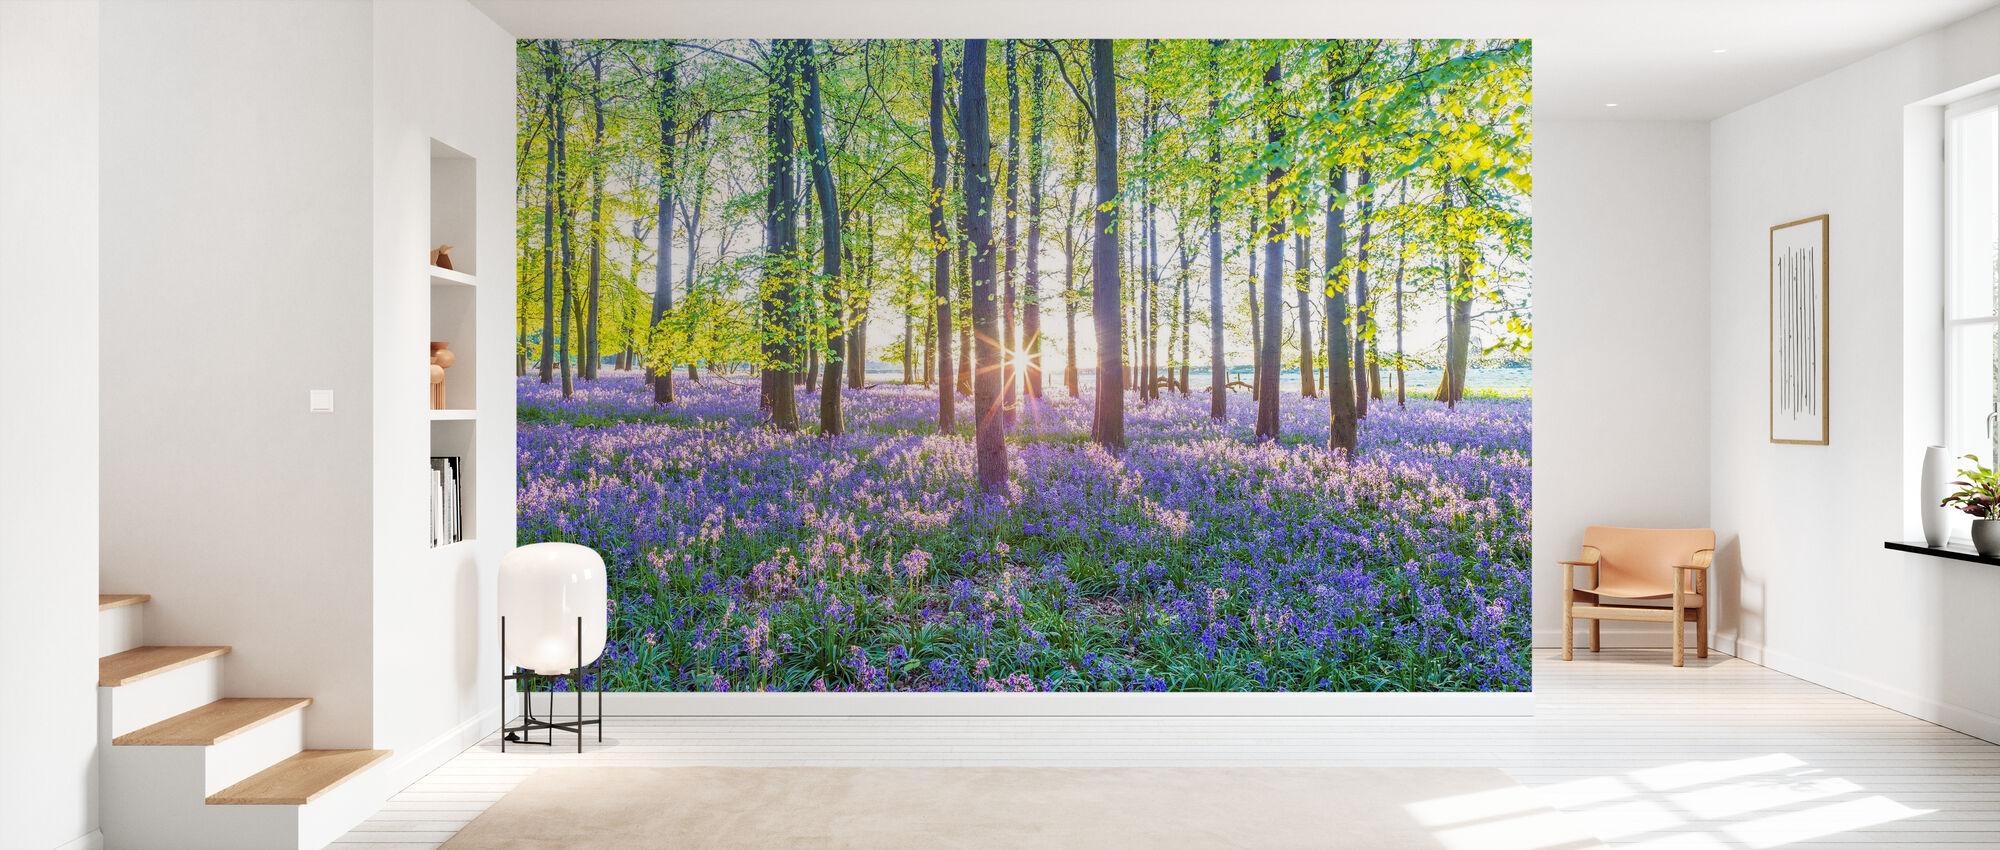 Bluebells - Wallpaper - Hallway